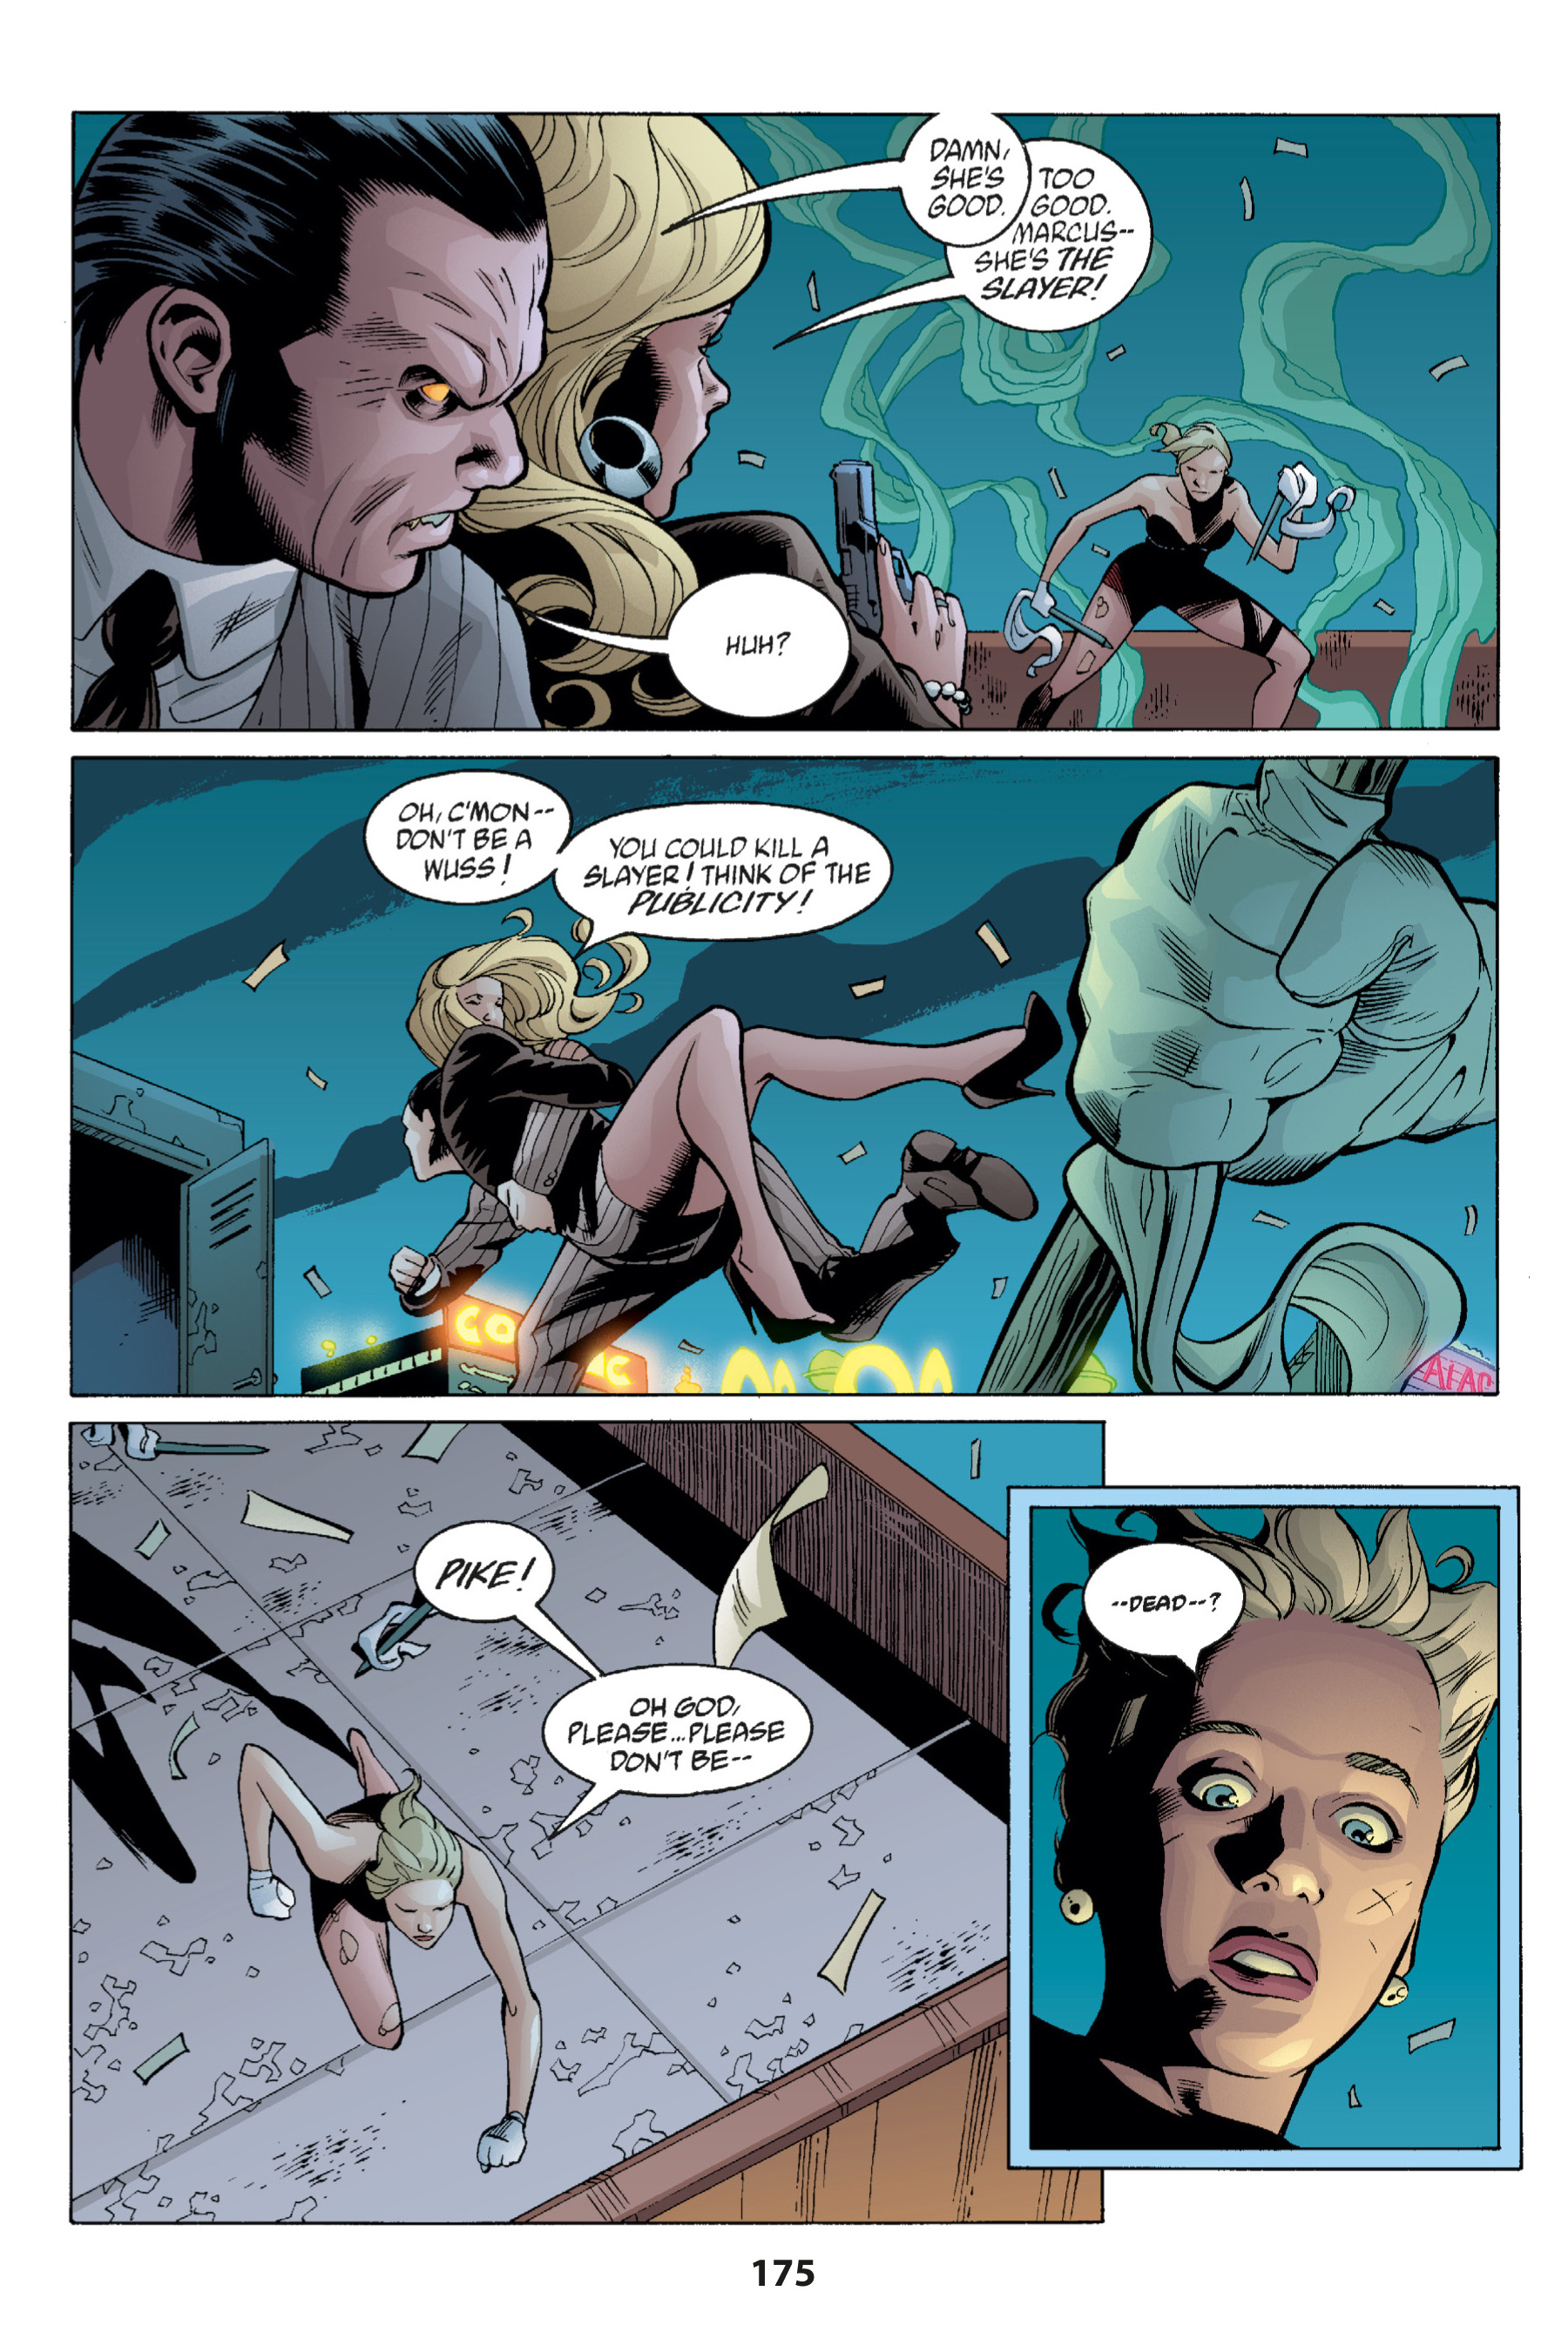 Read online Buffy the Vampire Slayer: Omnibus comic -  Issue # TPB 1 - 173